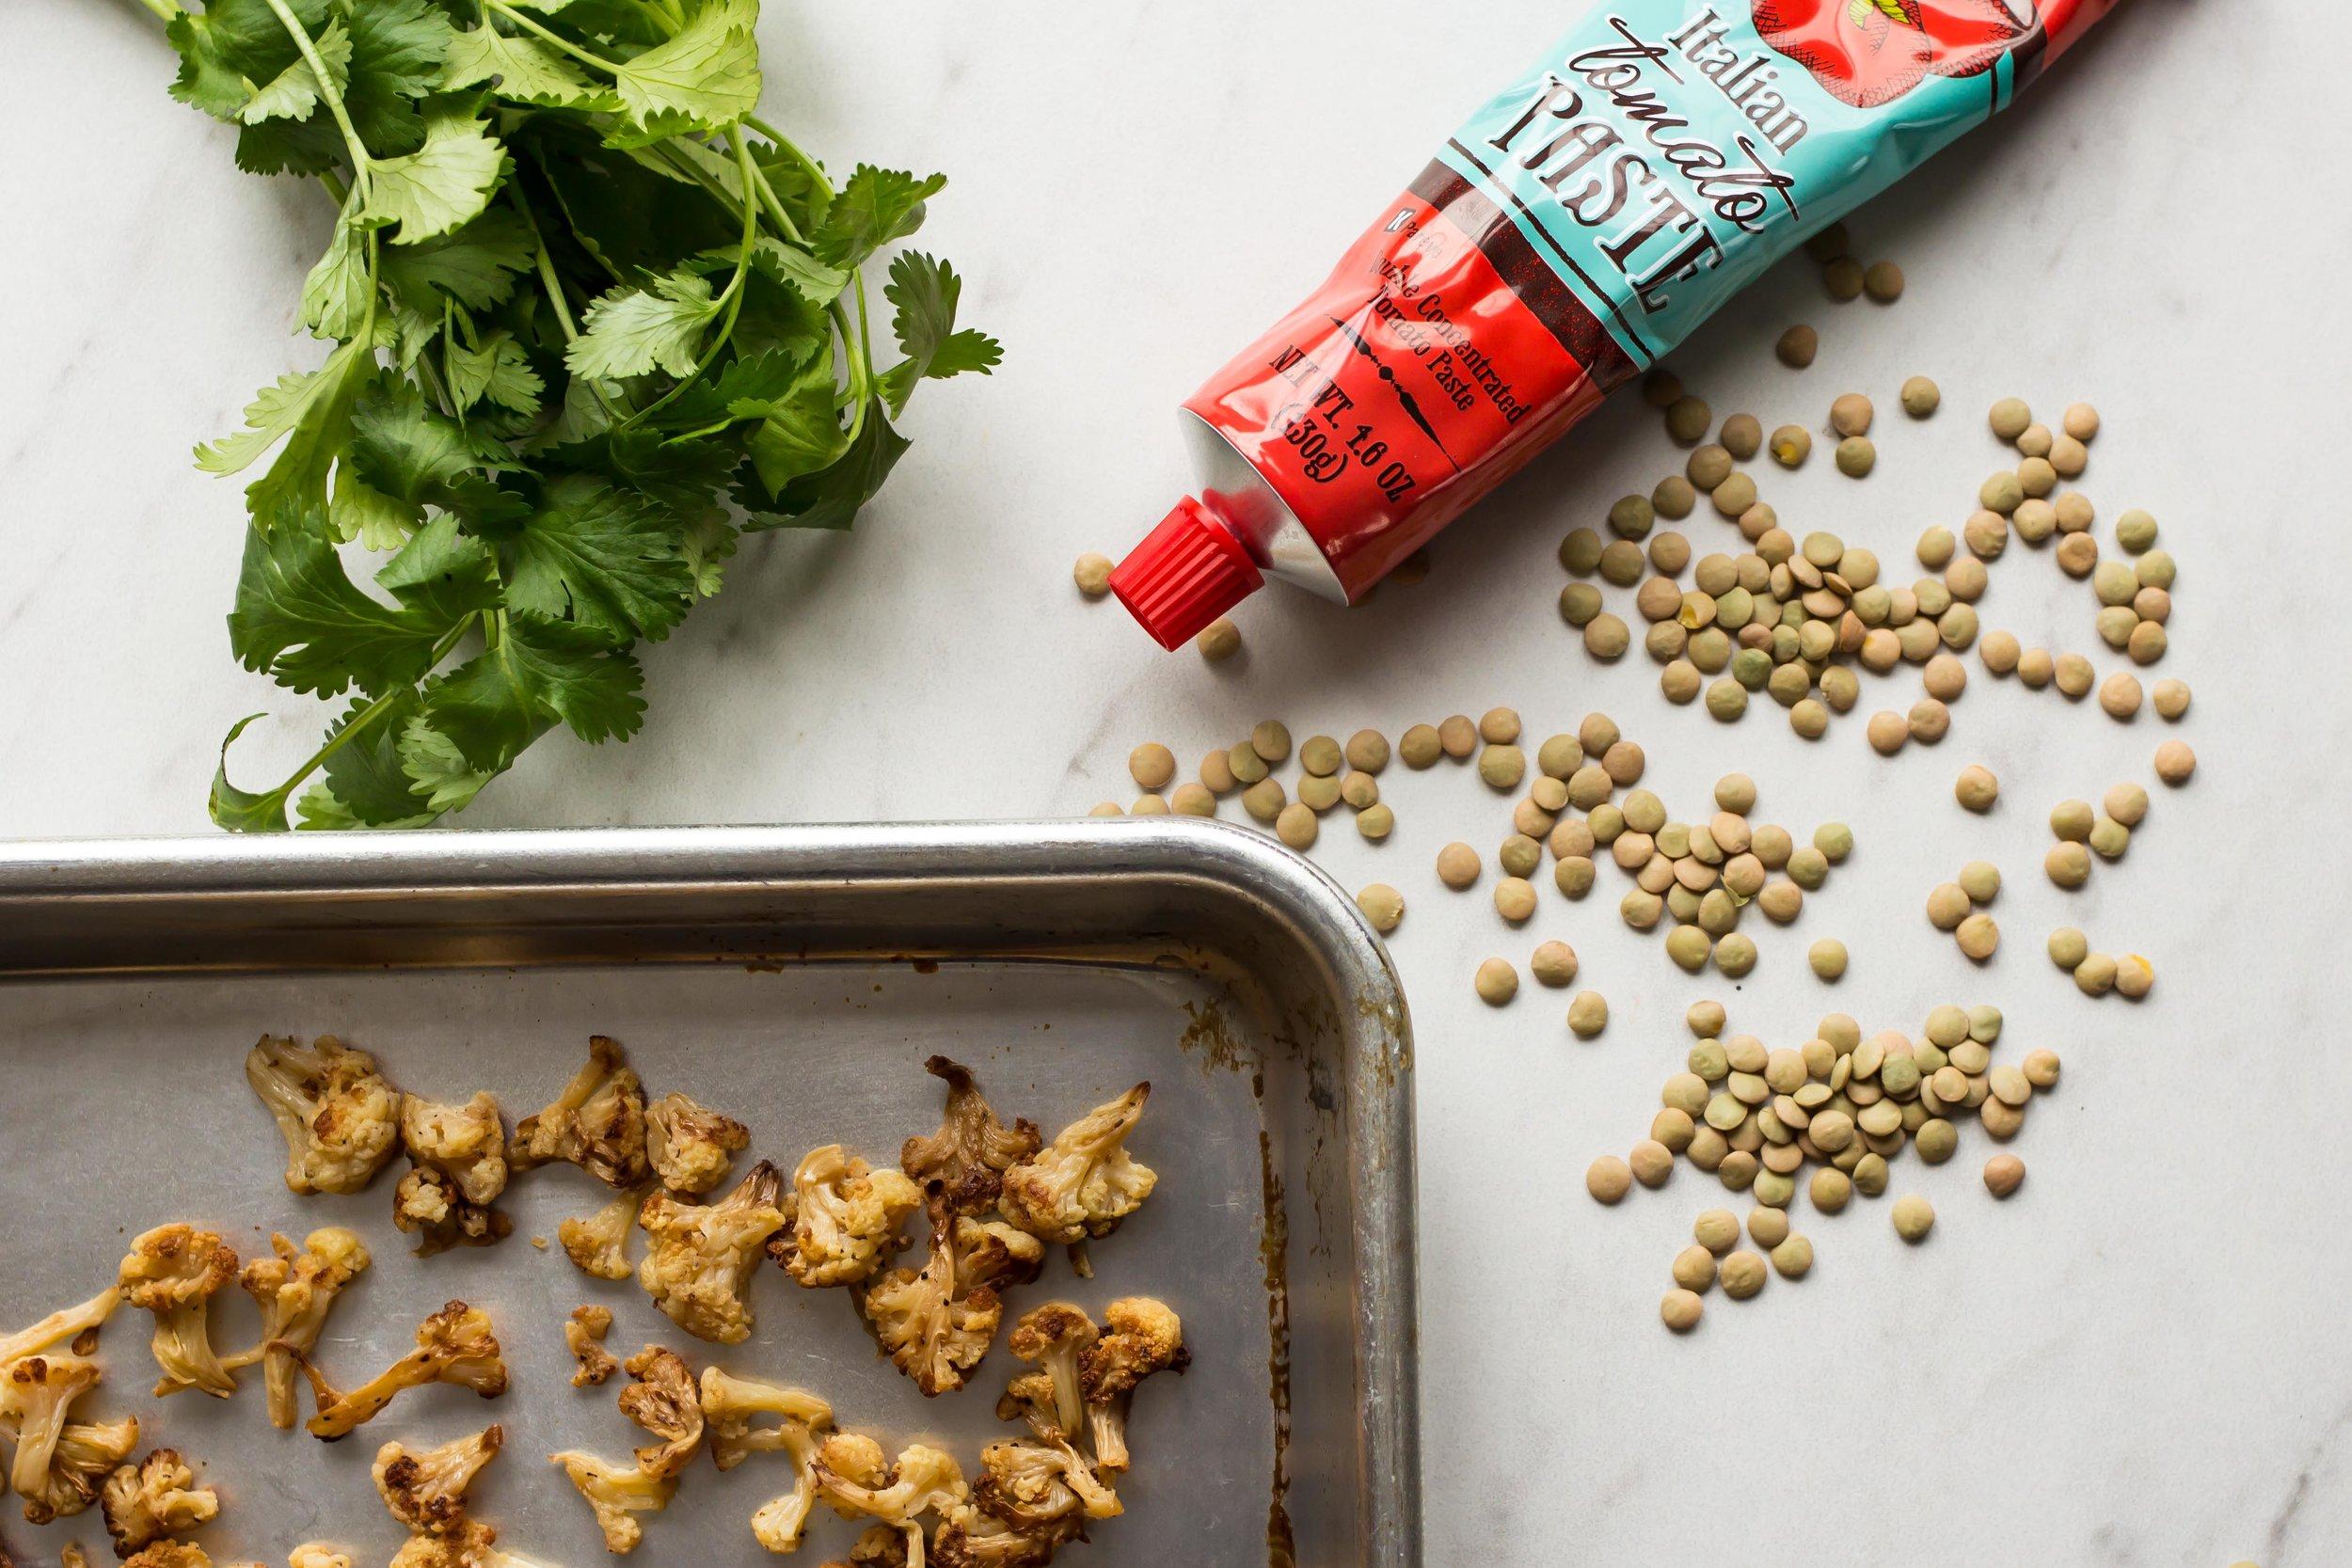 Vegan Recipes – Vegetarian Recipes – Vegan Dinners – Lentil Recipes – Vegan Taco Recipes – Vegan Family Recipes – Family Friendly Vegan Recipes – h eartandseam.co m #heartandseam #vegan #vegetarian